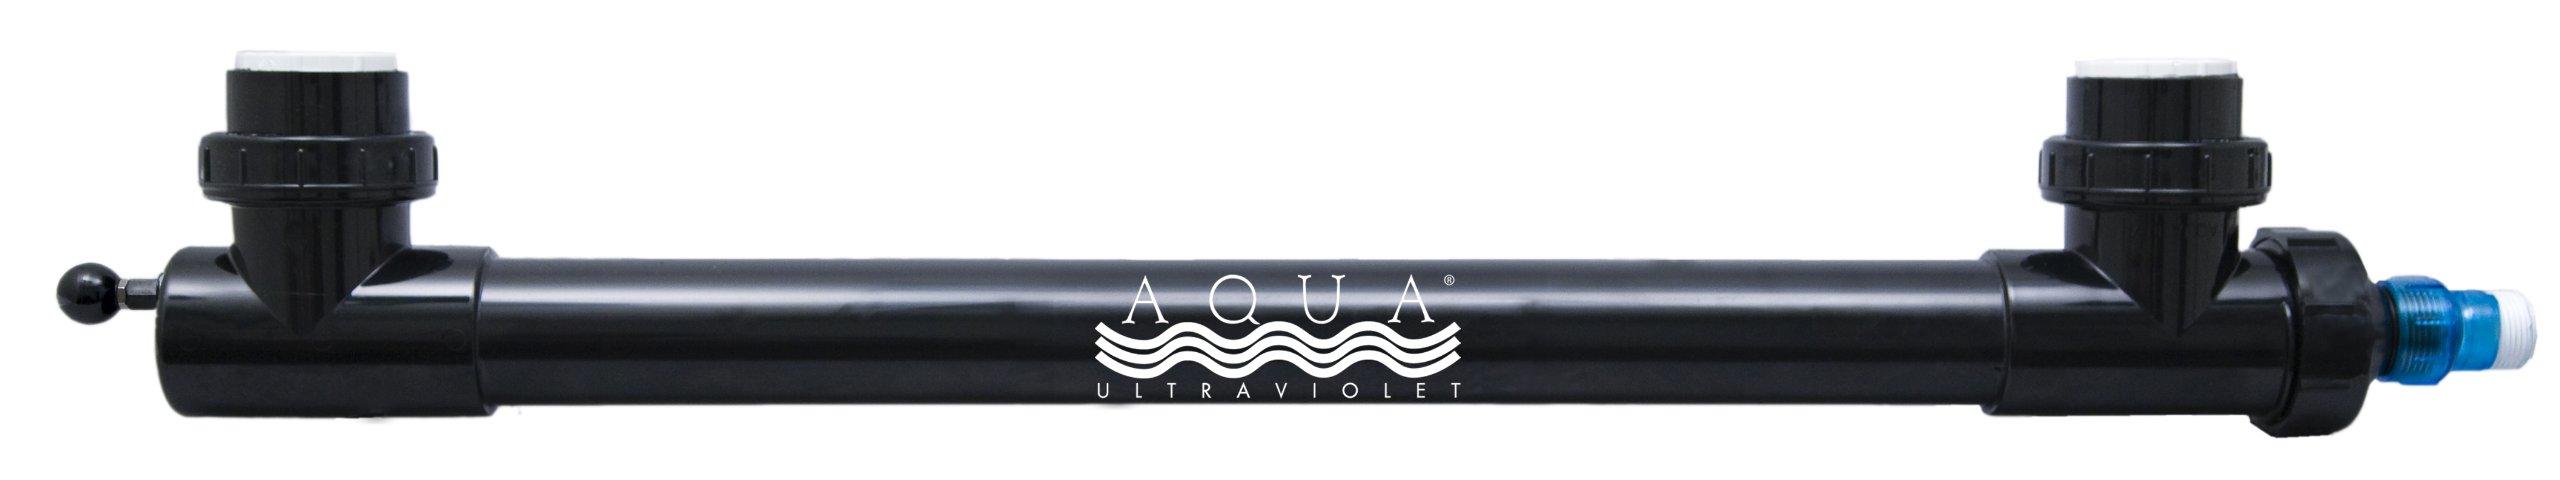 Aqua Ultraviolet AAV00063 UV Sterilizer Wiper for Aquarium, 40-watt, Black